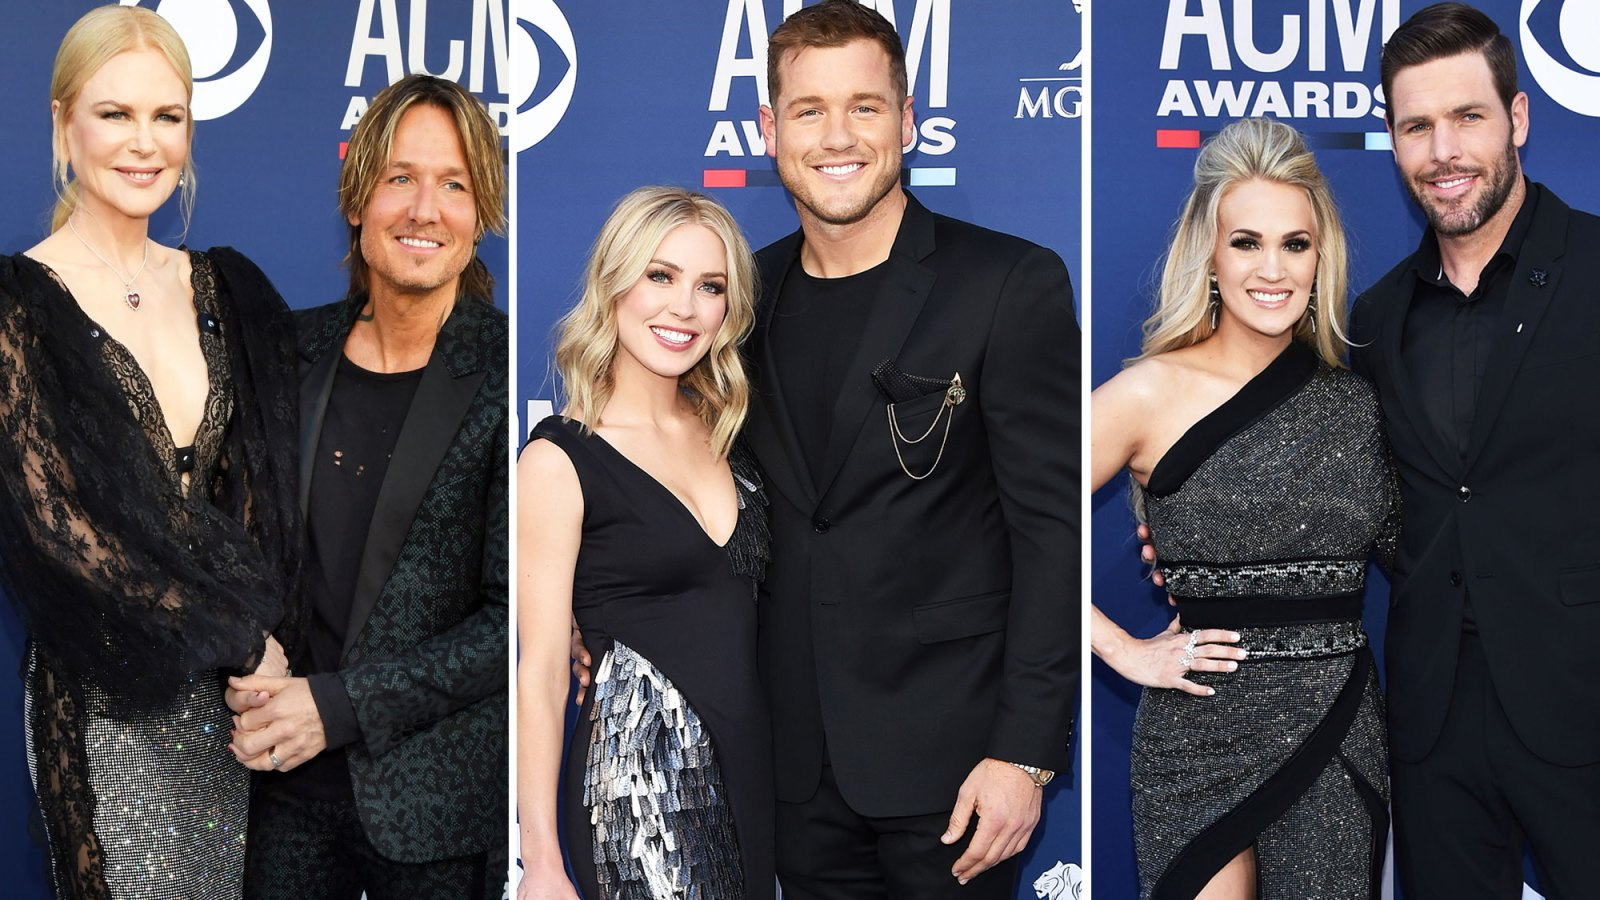 Acm awards 2019 red carpet fashion most stylish couples